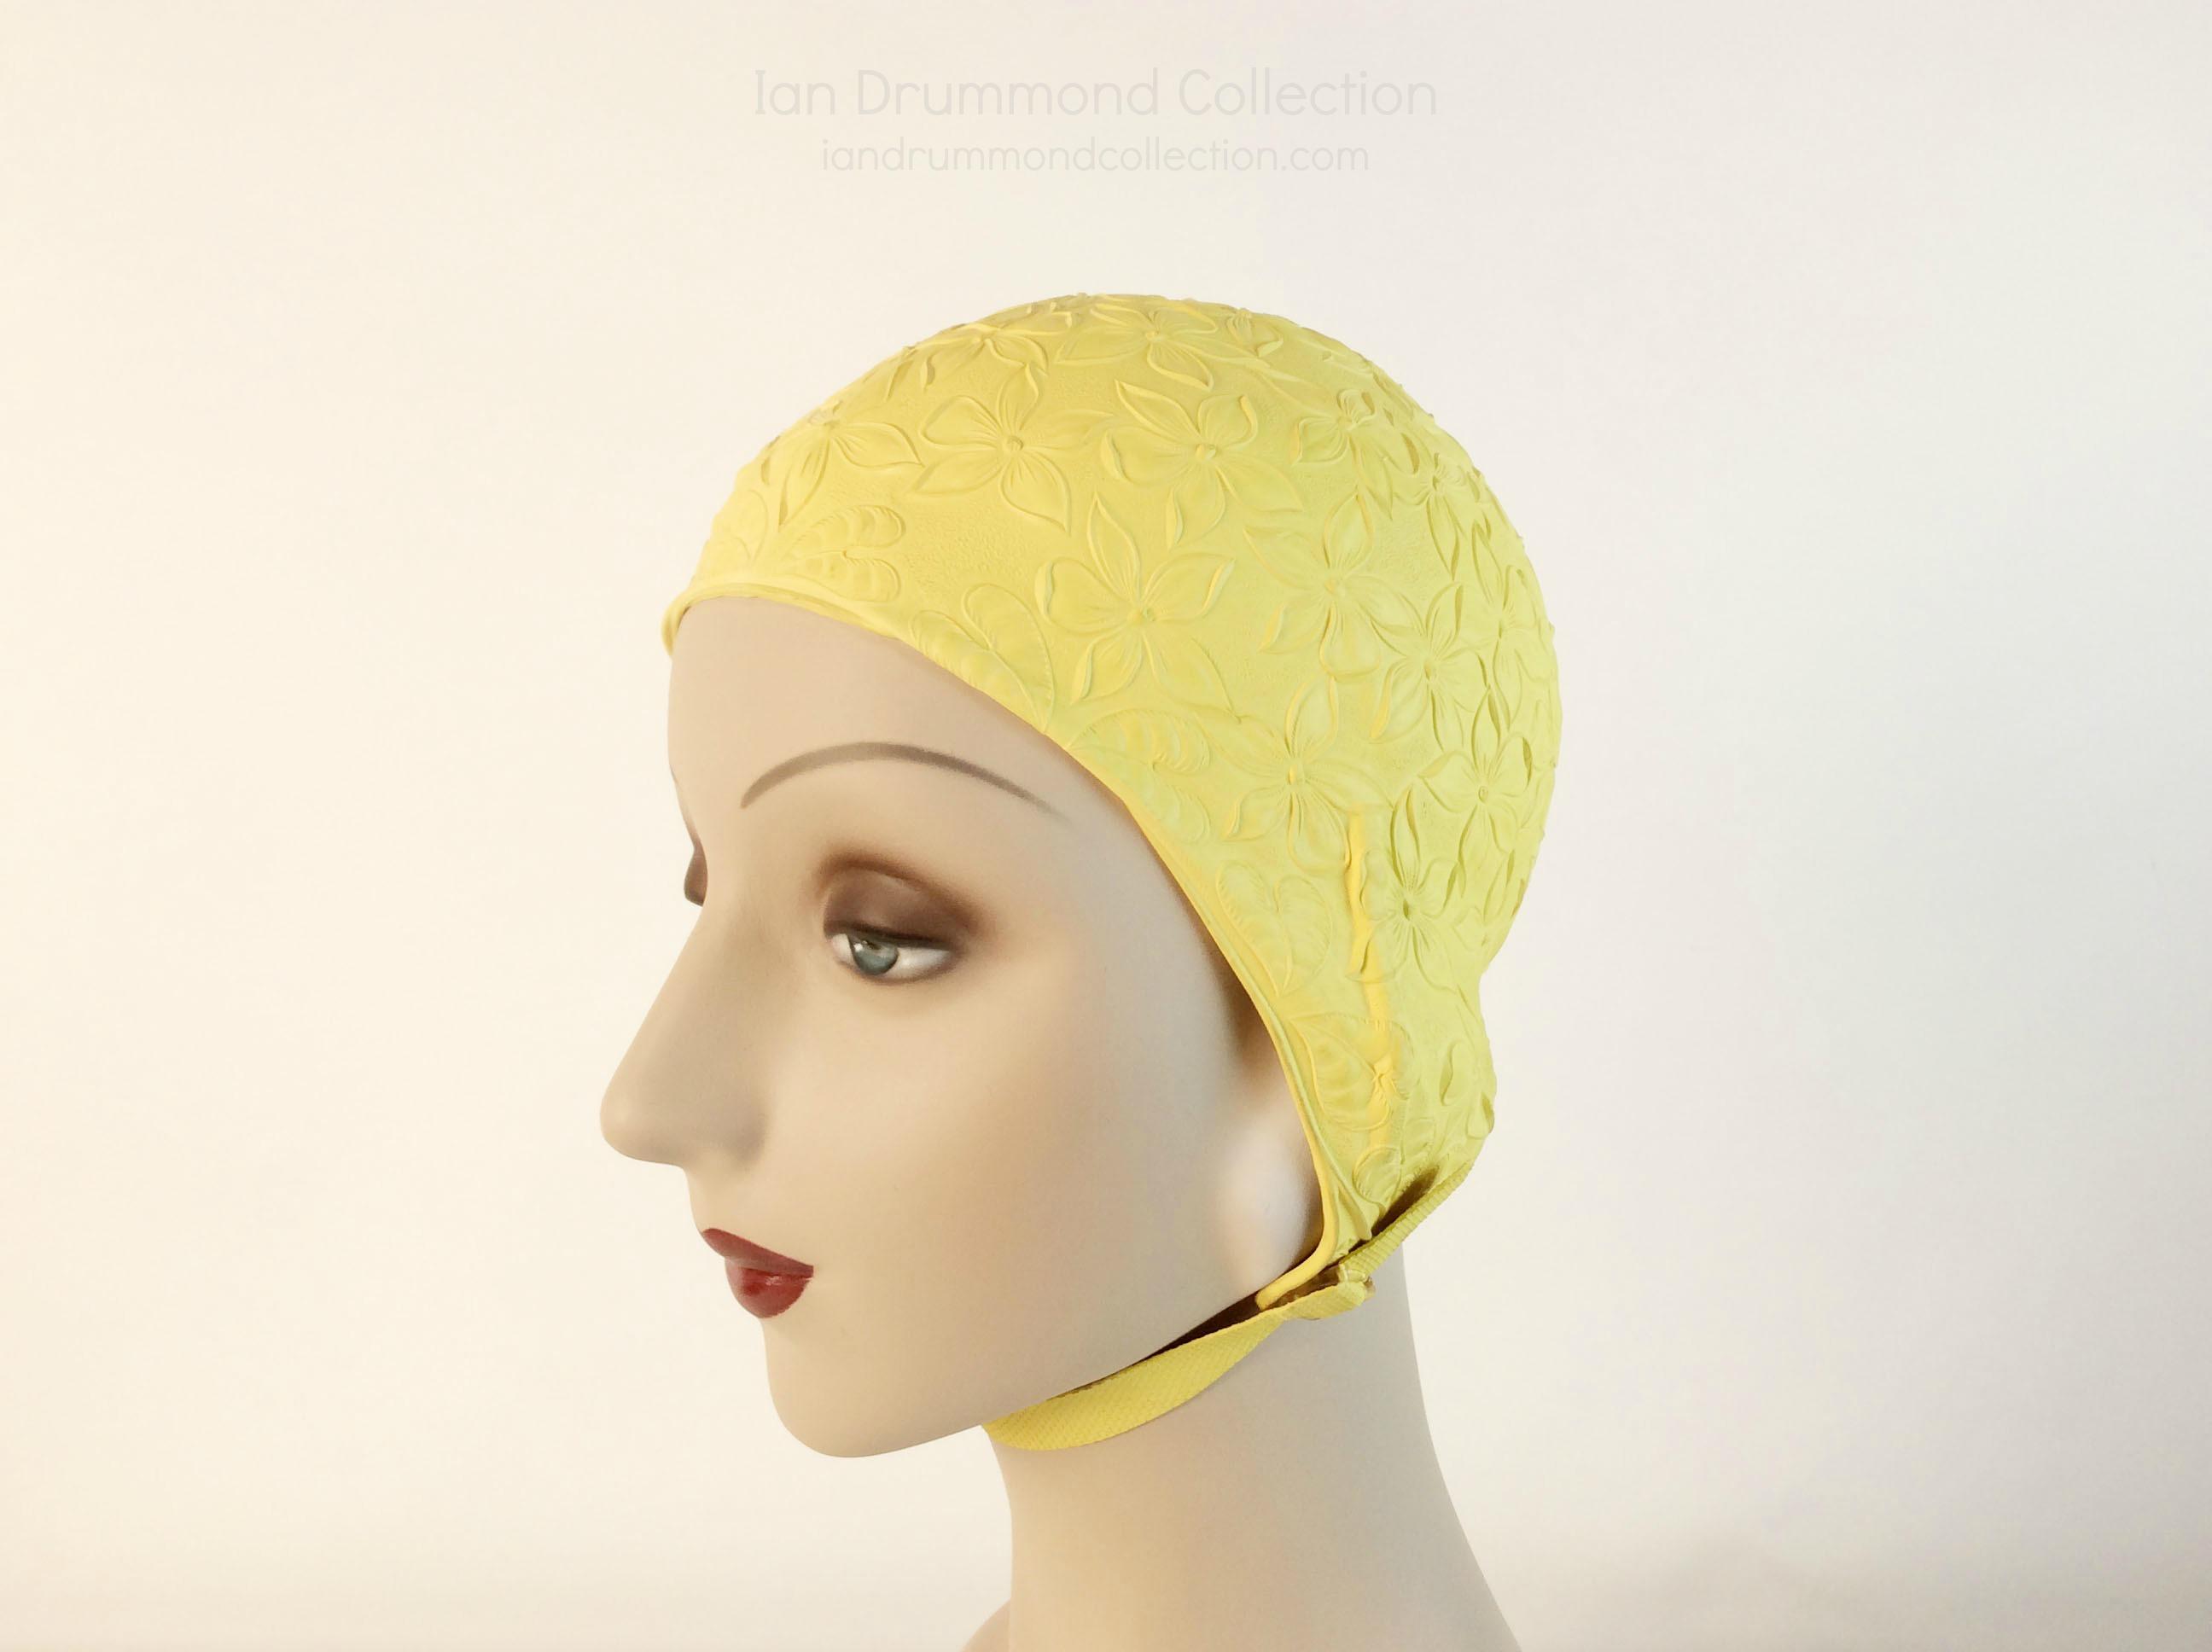 IDC Movie Wardrobe Rental Swim Cap 8 Yellow with Embossed Floer Designs